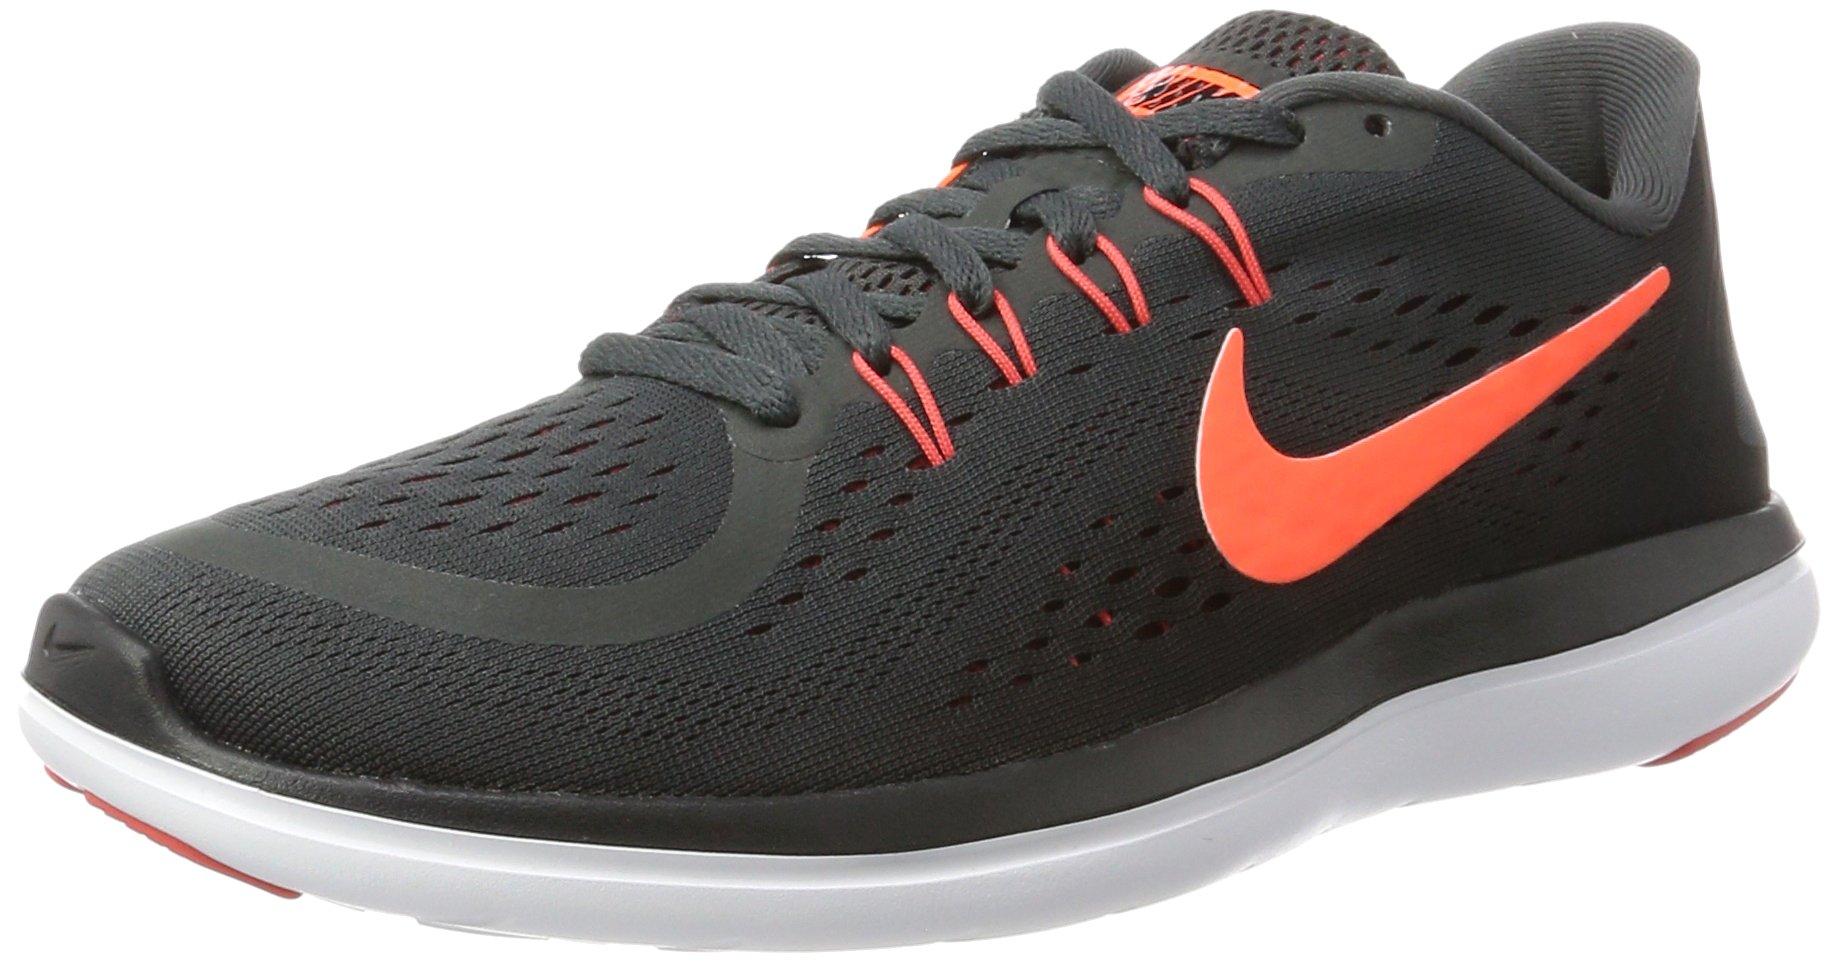 NIKE Men's Flex 2017 Rn Running Shoe (11.5 D(M) US, Anthracite/Hyper Orange/Black/Track Red)